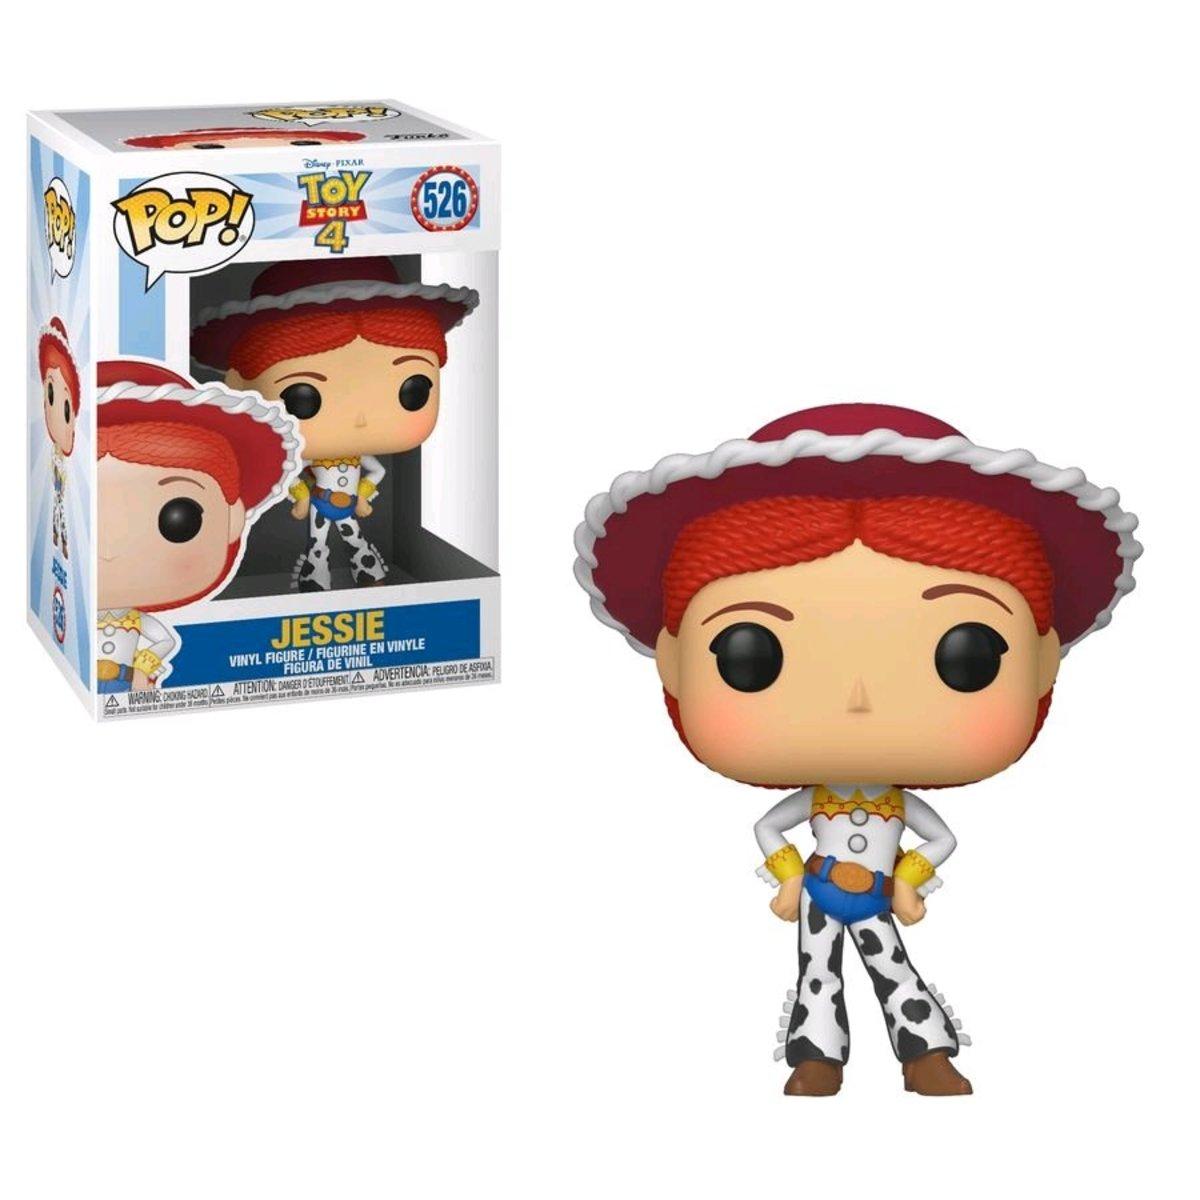 POP Disney: Toy Story 4 - Jesse [Licensed by Disney]